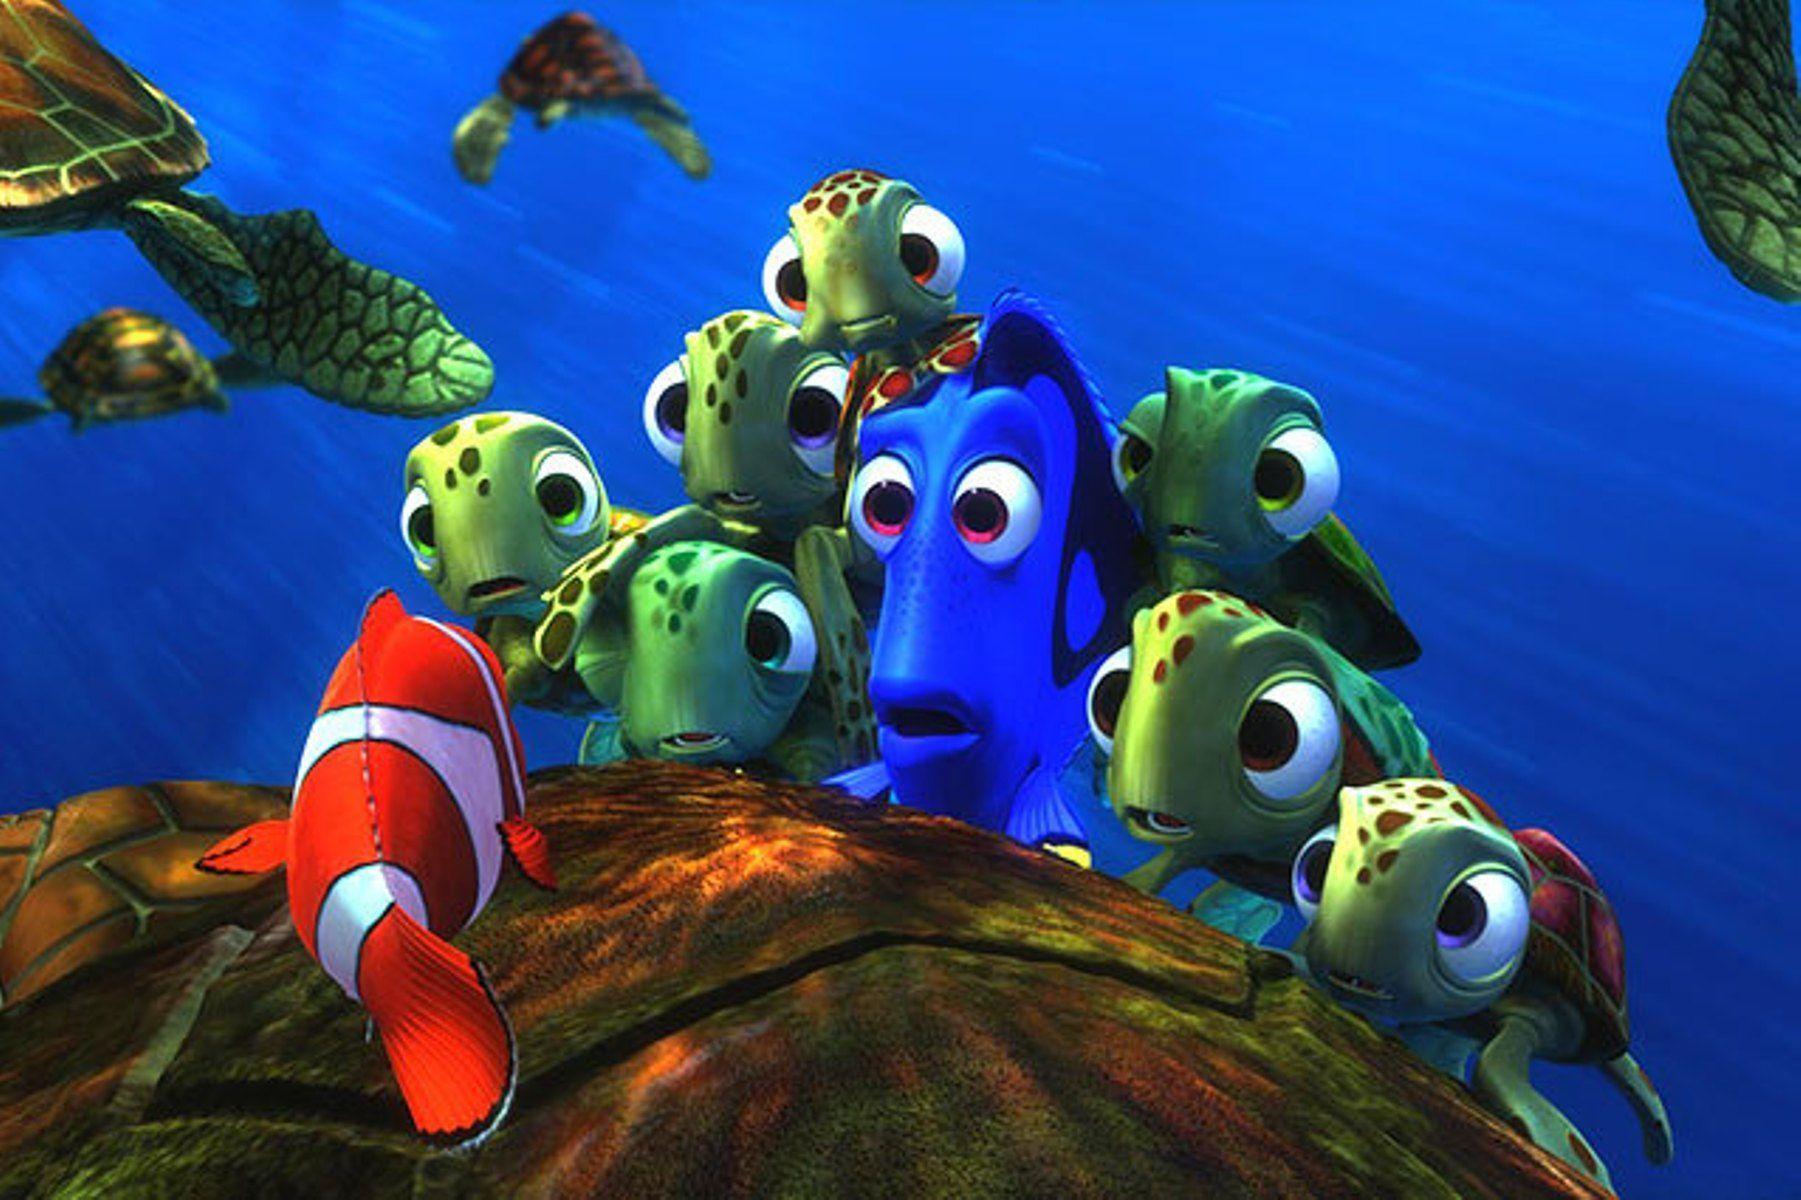 Finding Nemo Dory Wallpaper Desktop Background Wallpapers HD